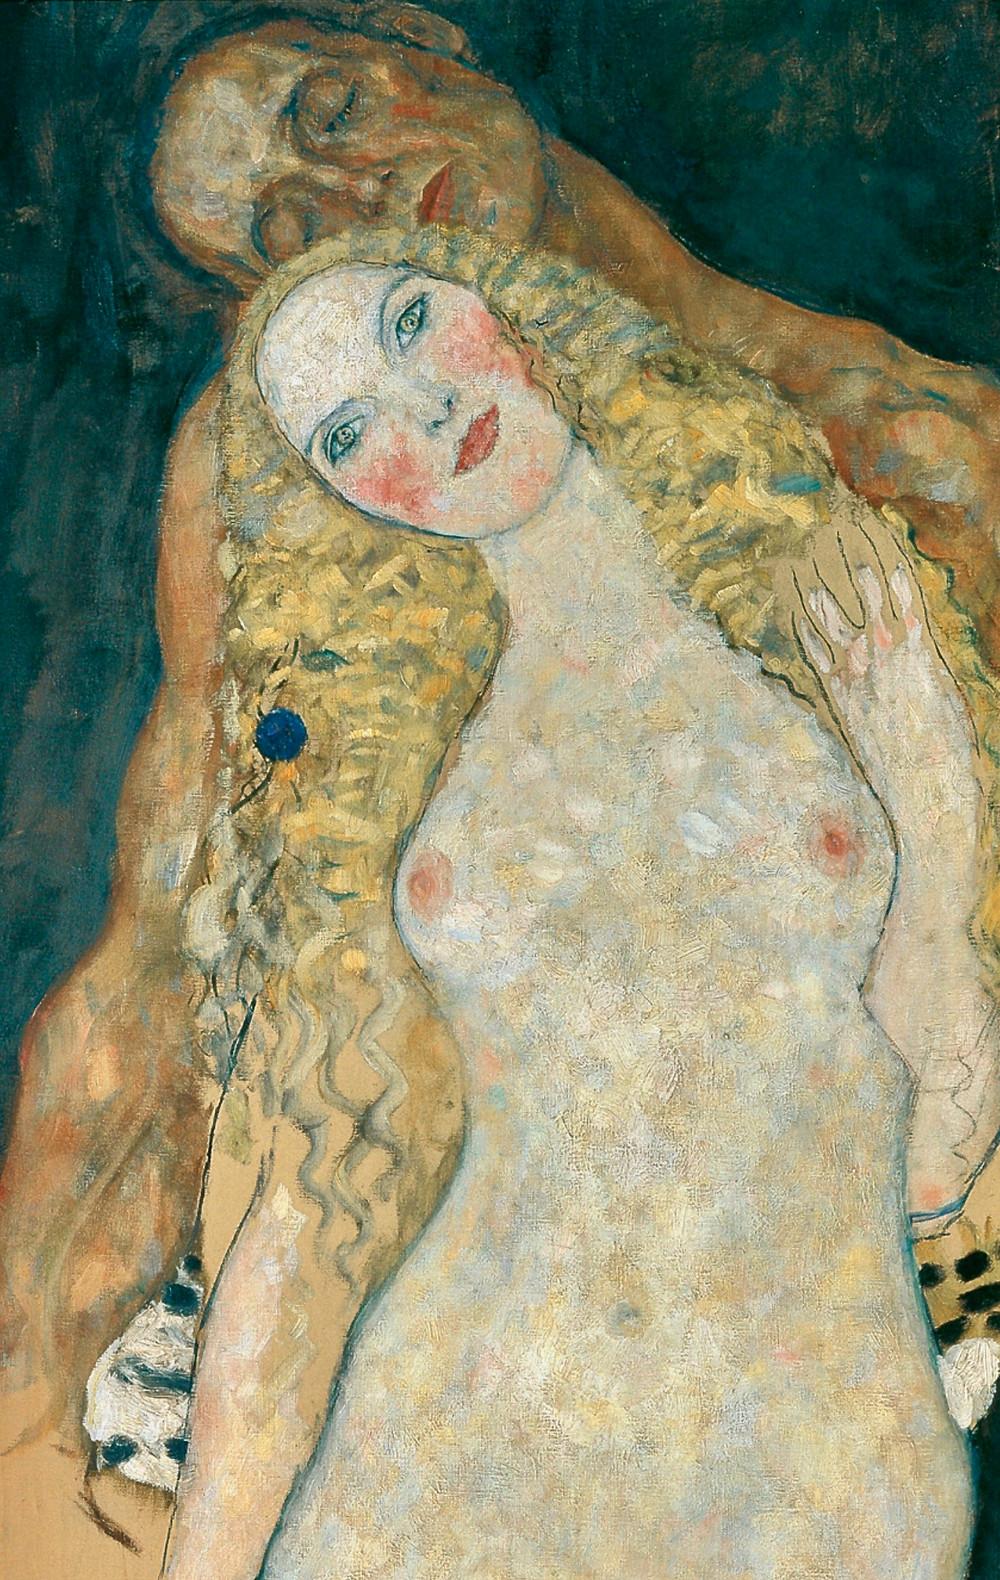 Klimt, detail of Adam and Eve, 1917-18